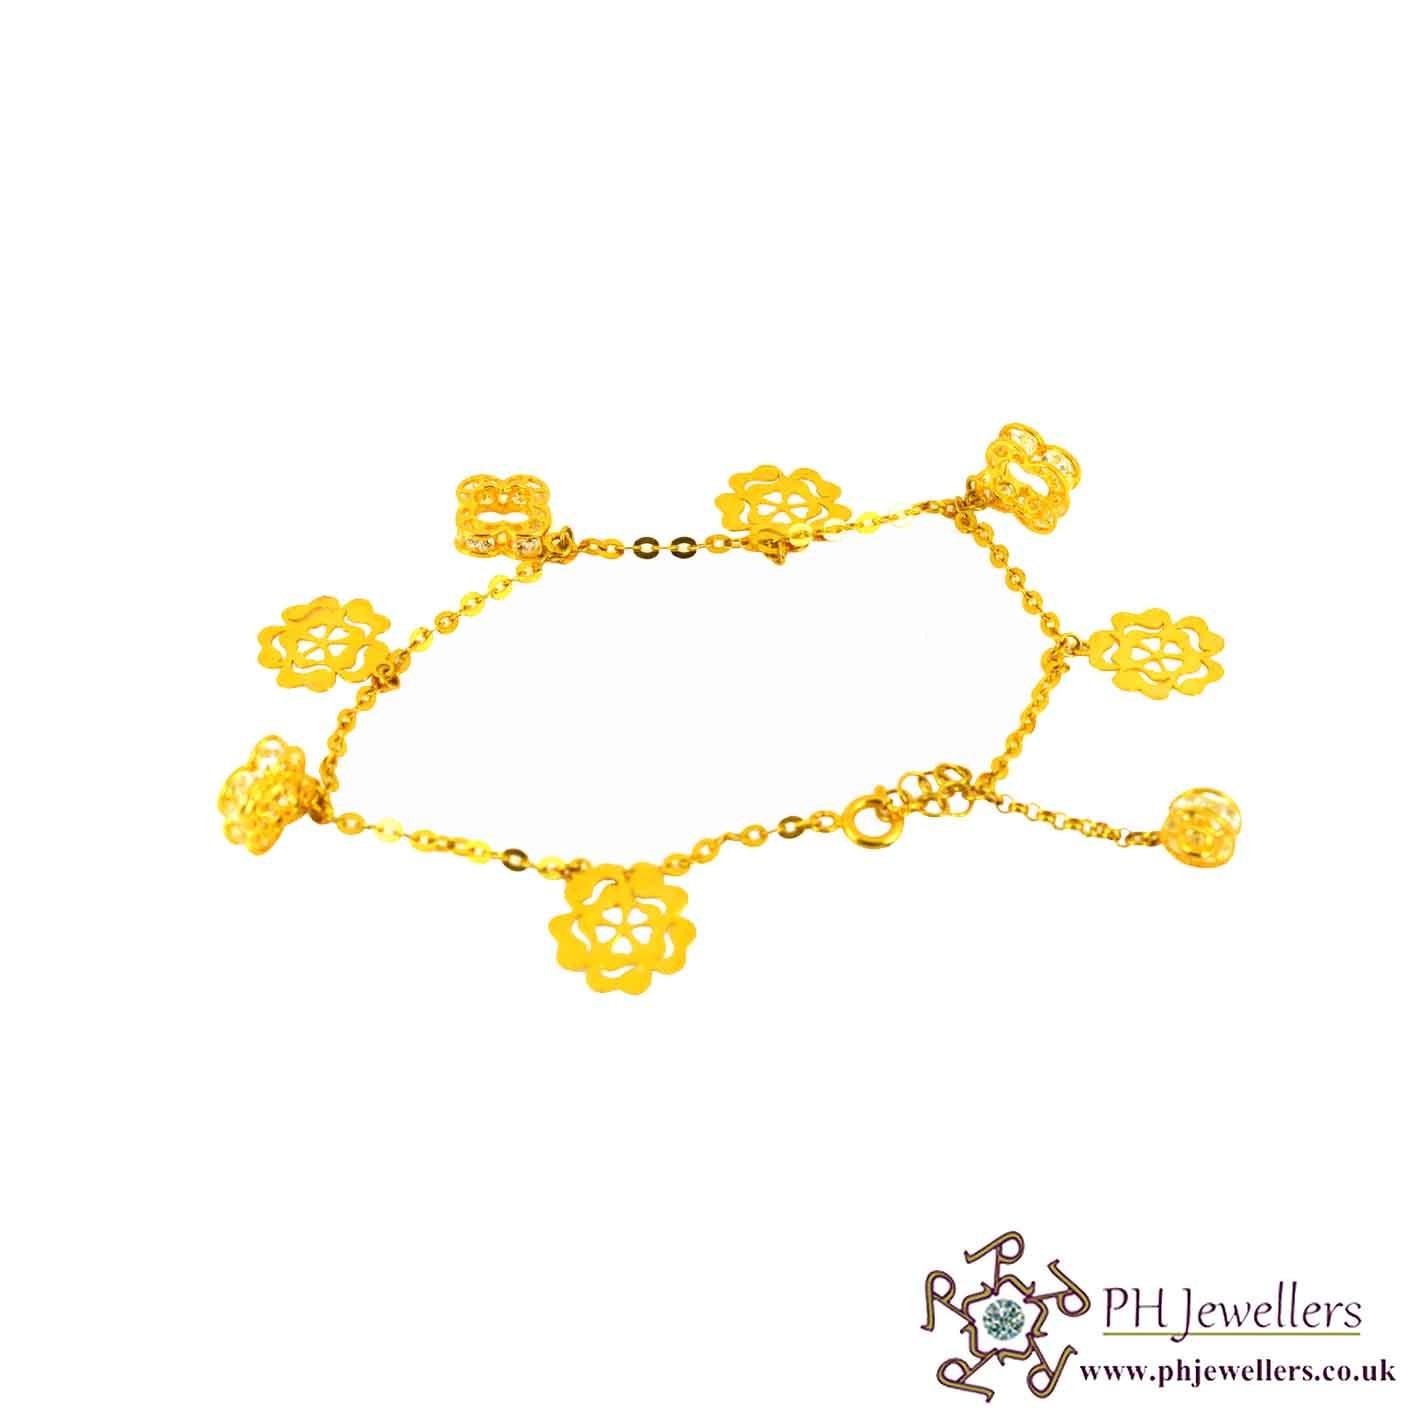 22ct 916 Hallmark Yellow Gold Charm Bracelet CZ LB24